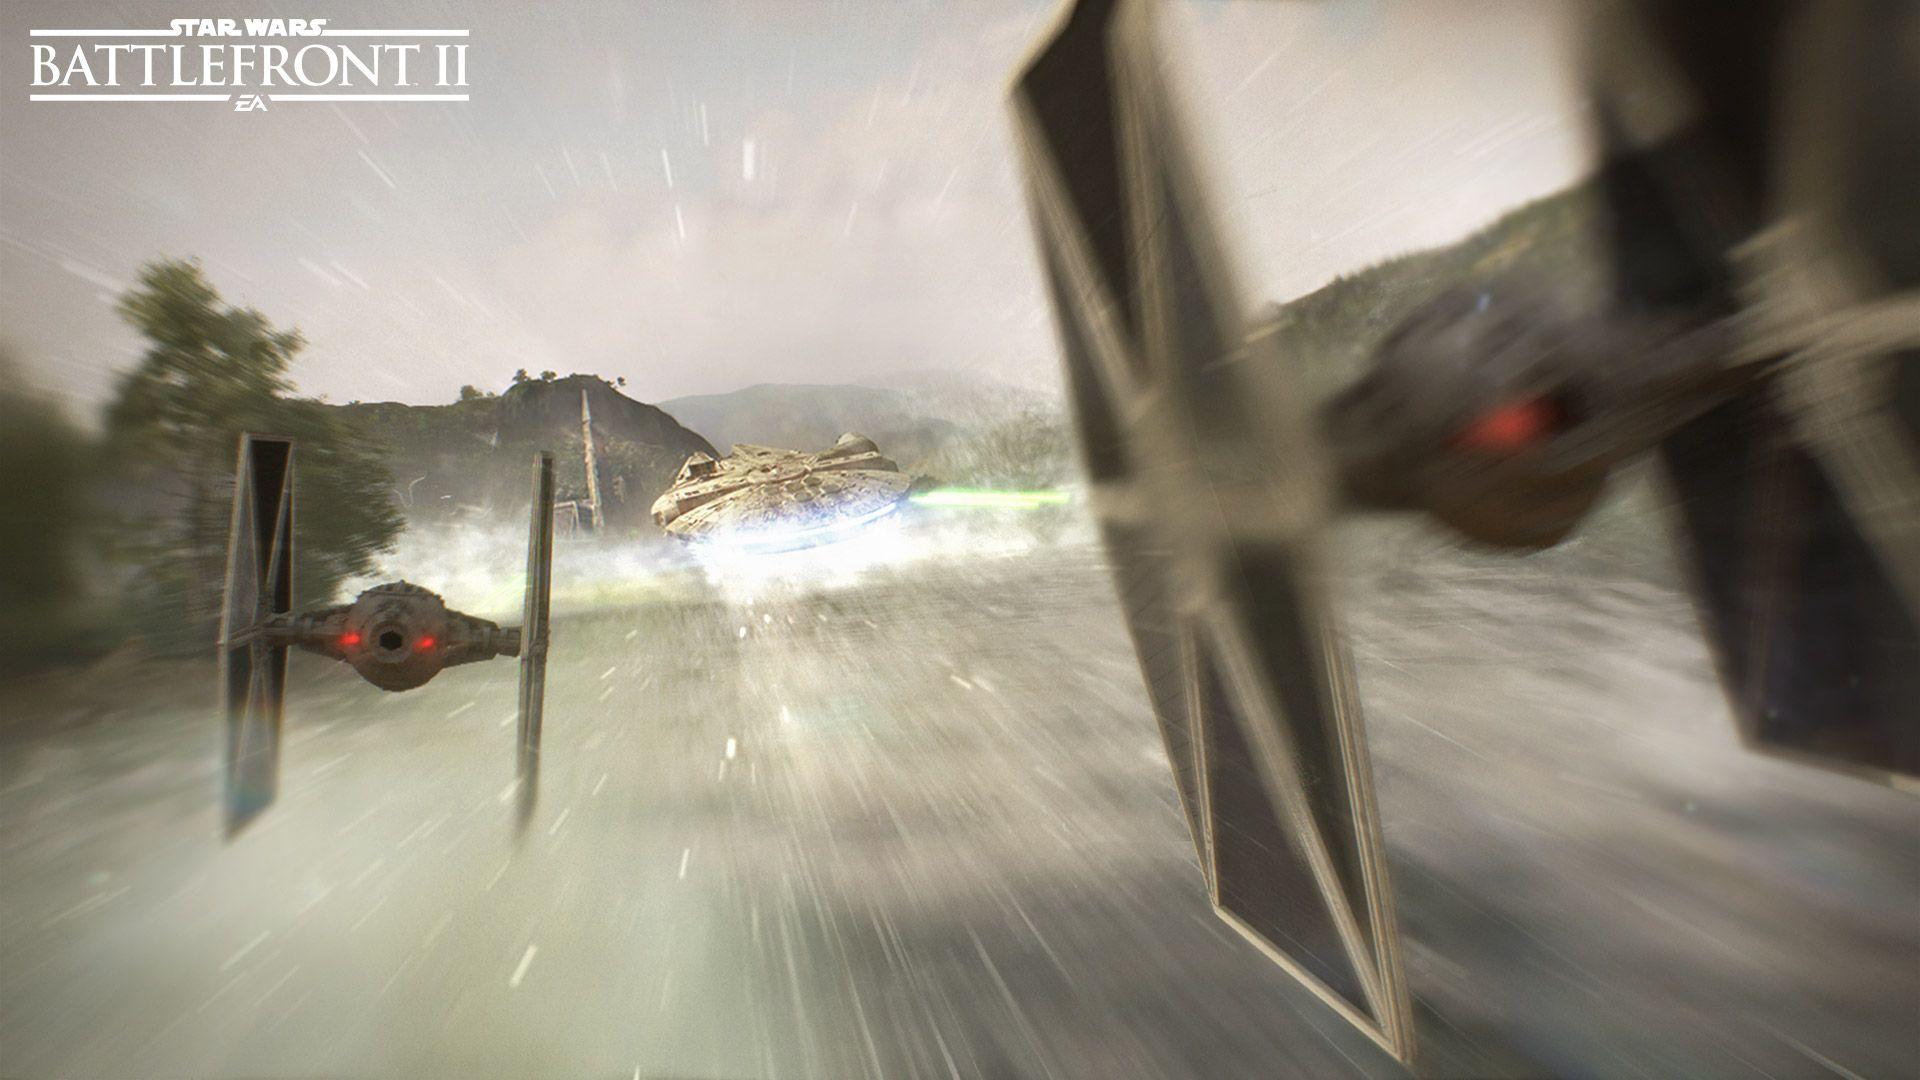 Star Wars Battlefront 2 Hd Wallpaper Posted By Samantha Tremblay